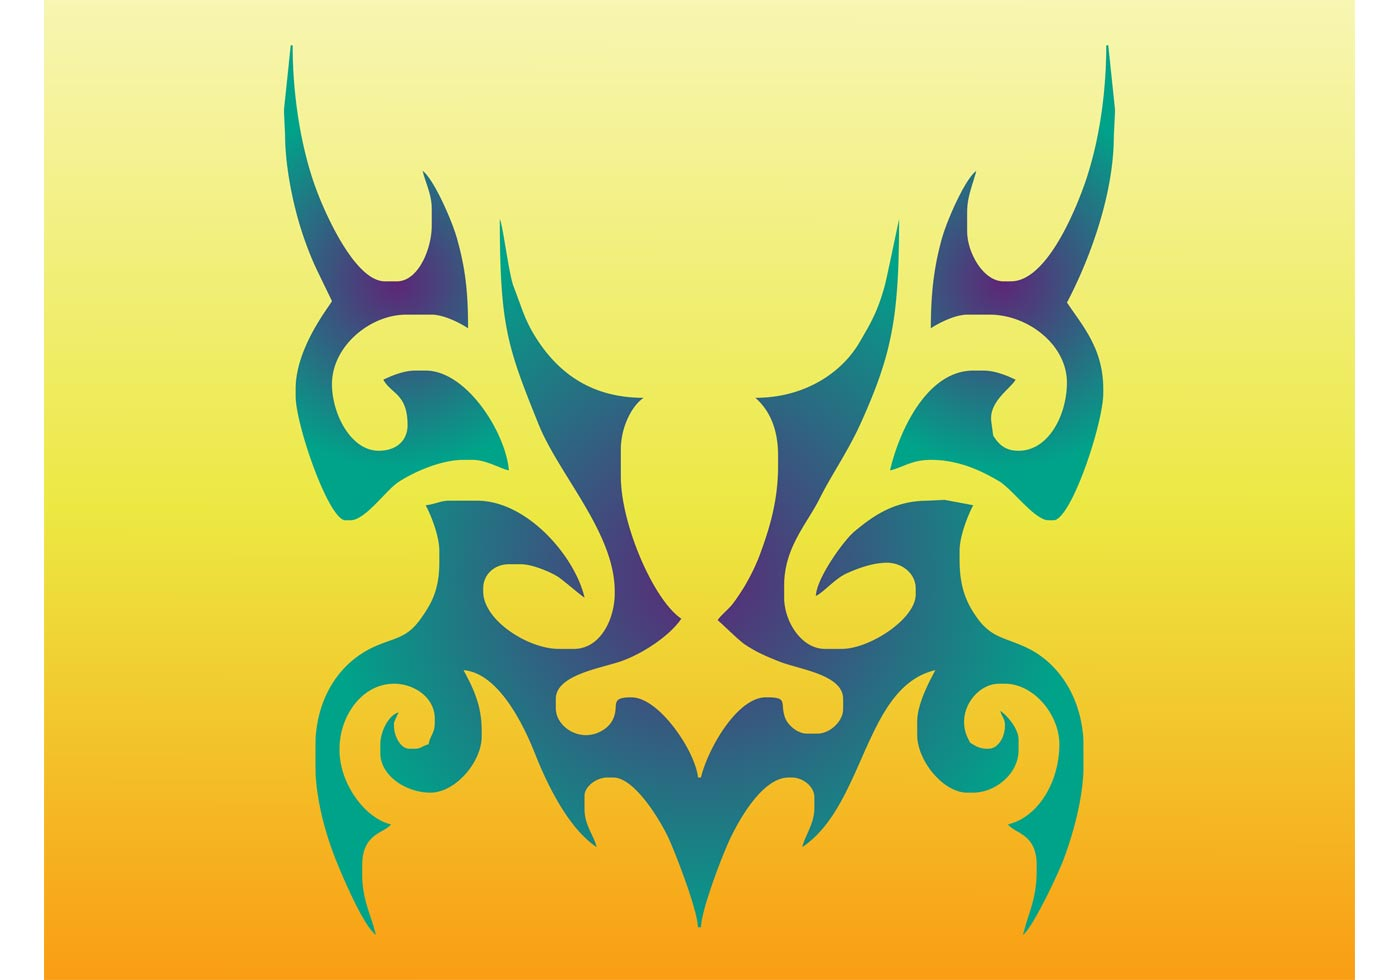 tattoo design download free vector art stock graphics images. Black Bedroom Furniture Sets. Home Design Ideas